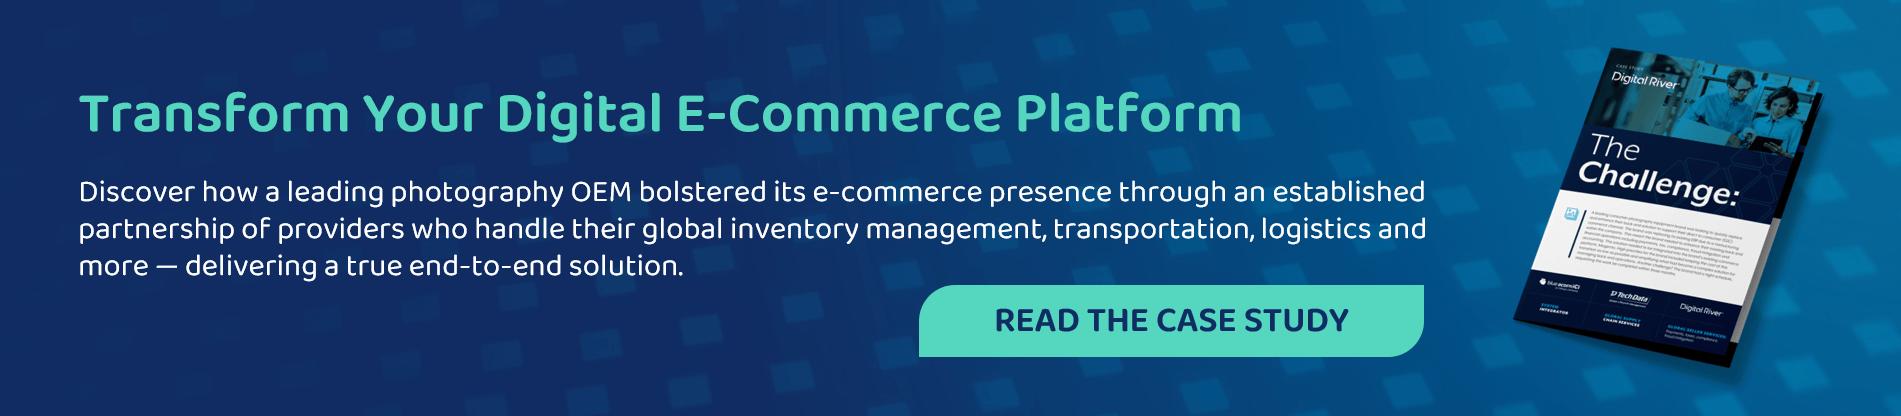 Transform-digital-ecommerce-platform-Digital-River-case-study